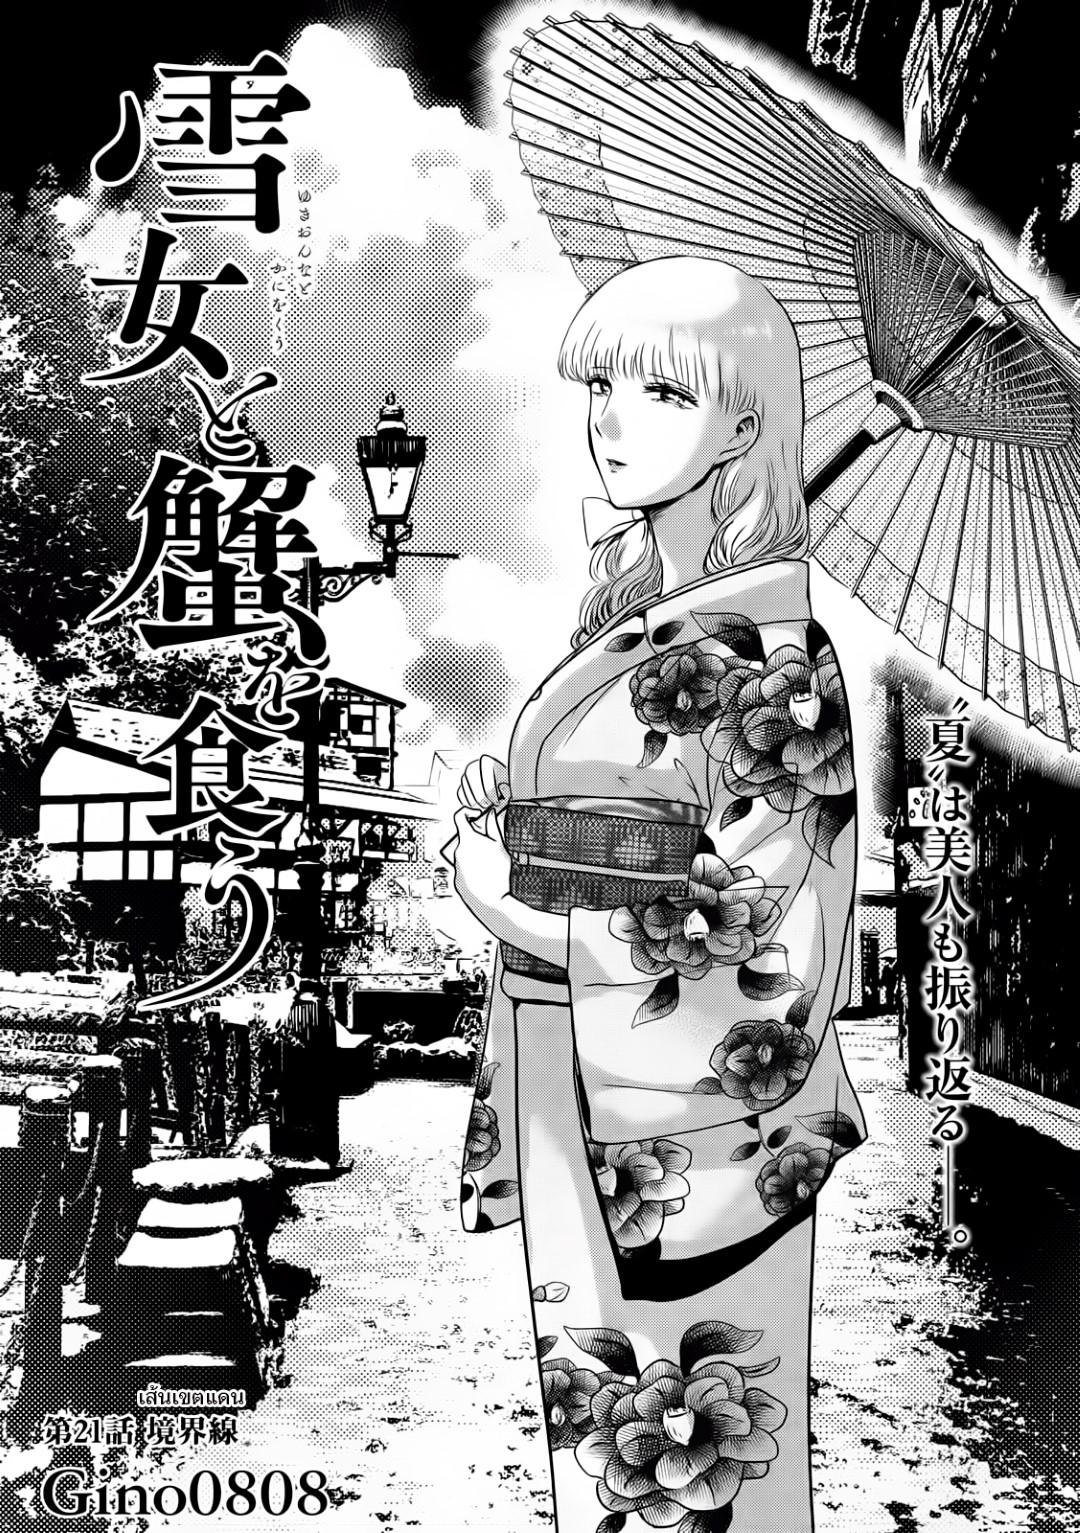 Yukionna to Kani wo Kuu-ตอนที่ 21